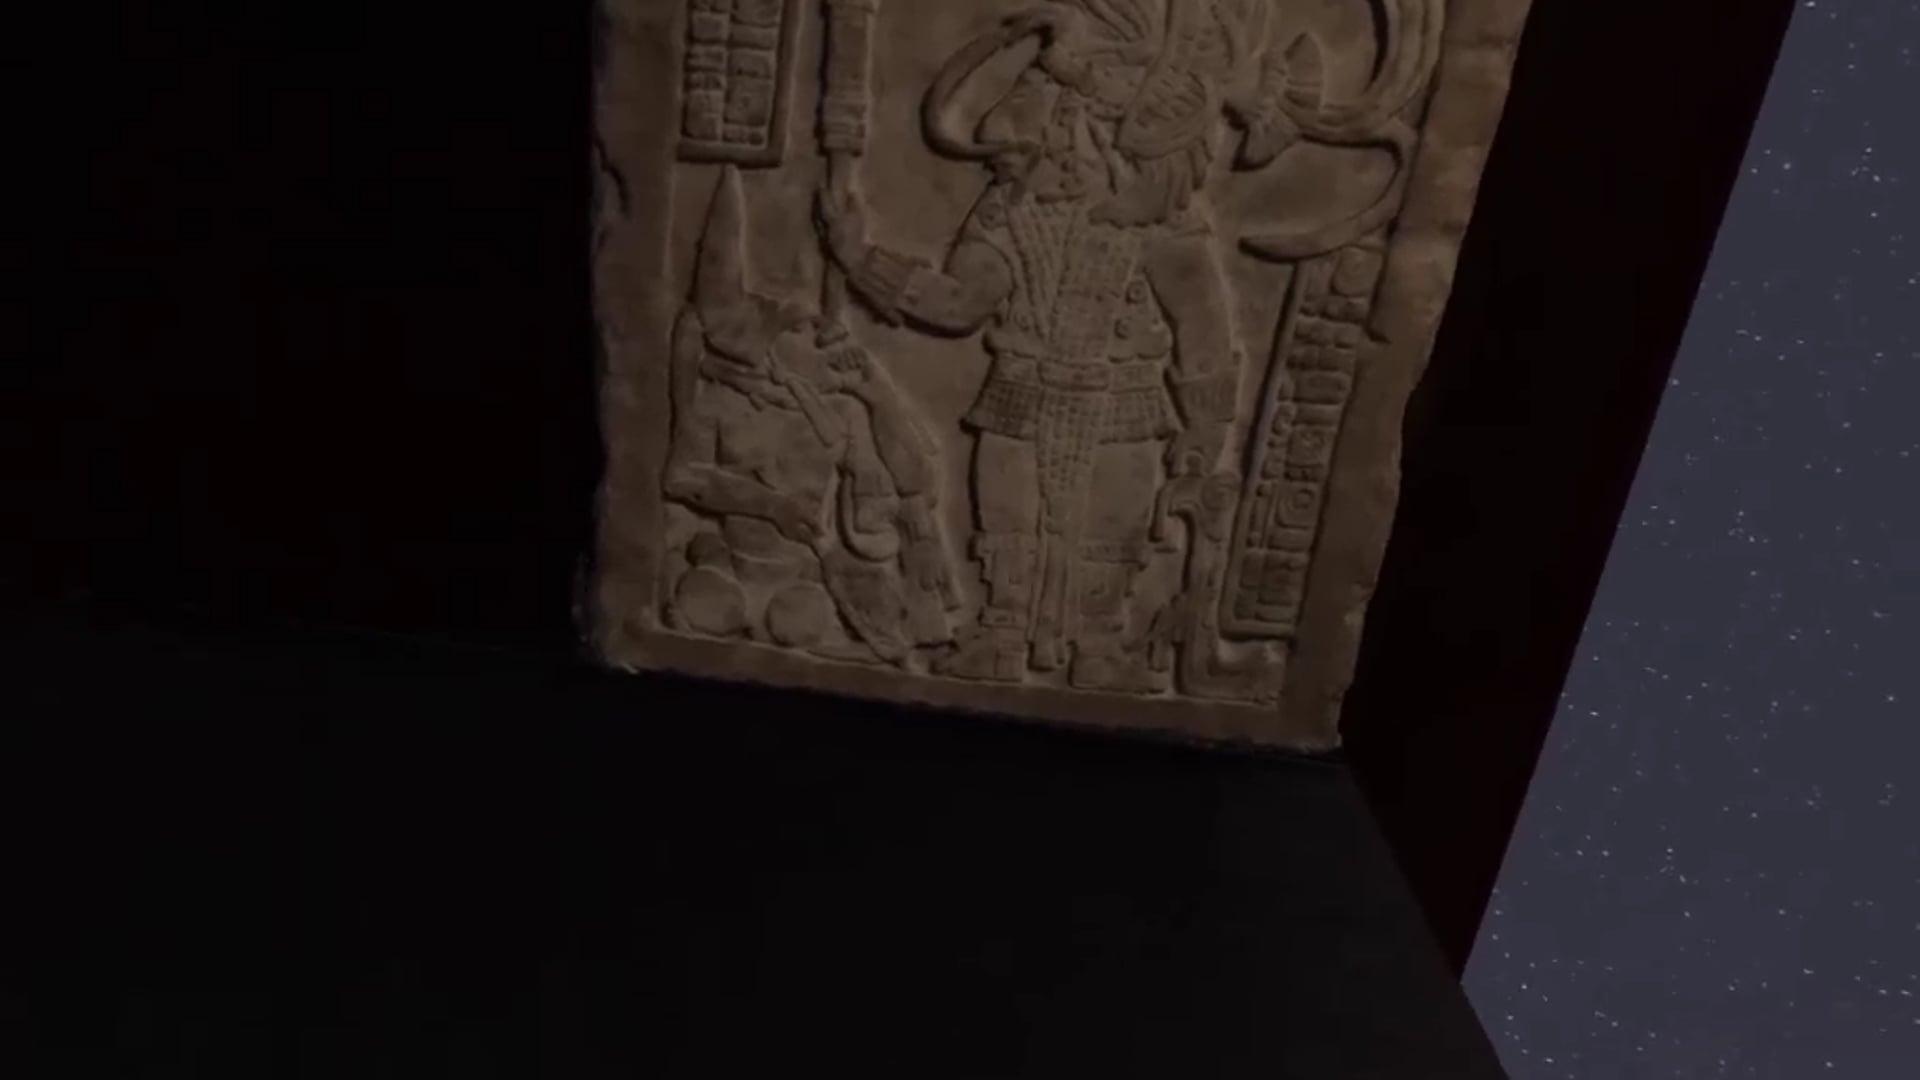 The Yaxchilán Lintels - Early Teaser